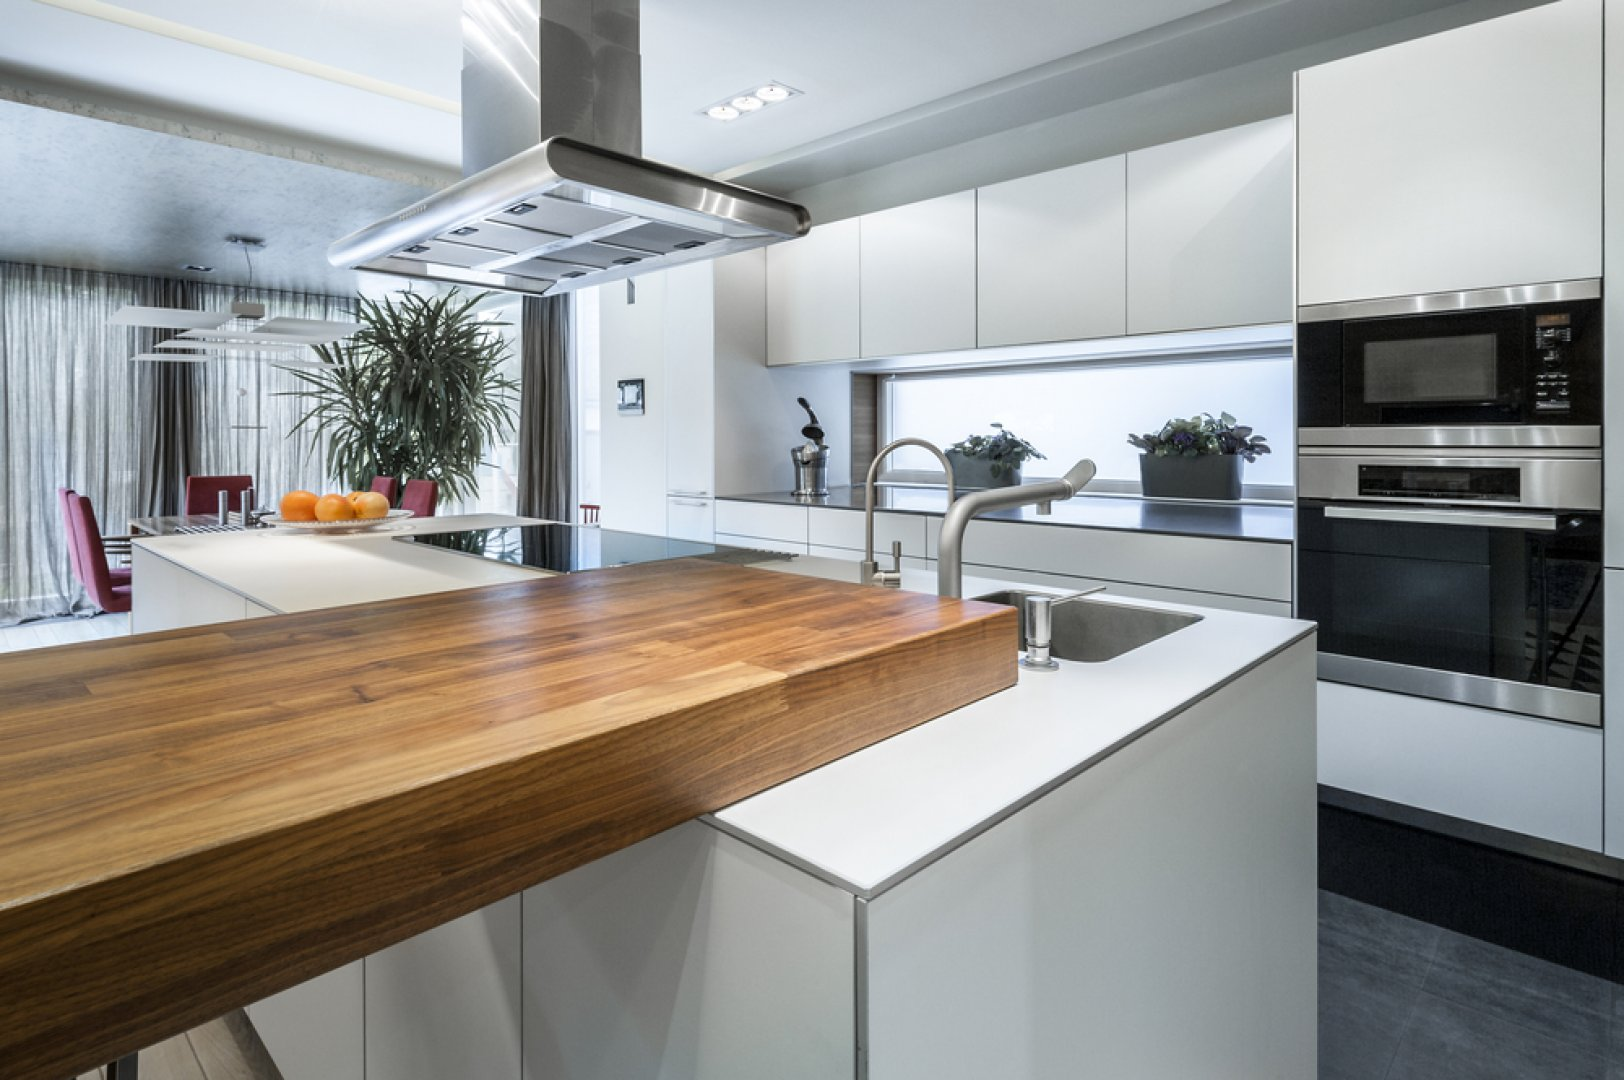 Rinnovare la cucina: migliorarla senza sostituirla - SecondLifeKitchen